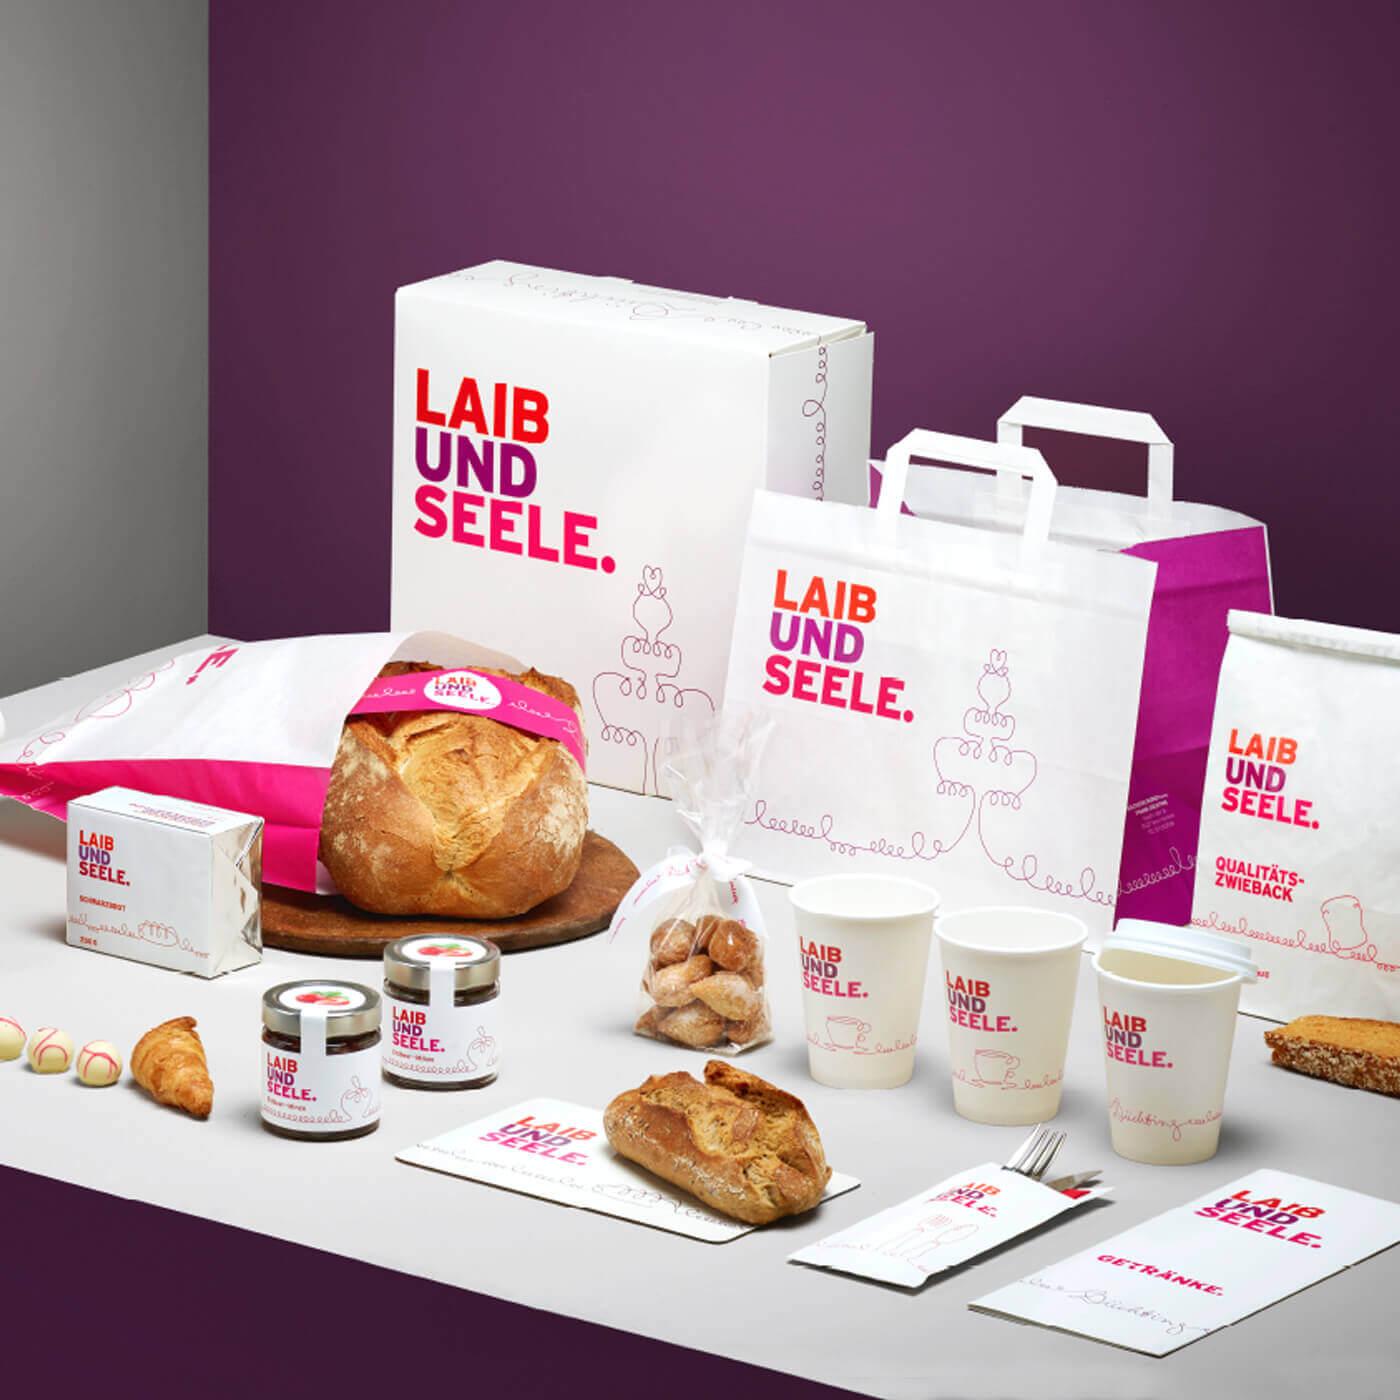 cyclos Laib & Seele Marketing Werbung Werbeagentur Geschäftssachen Packaging Verpackung